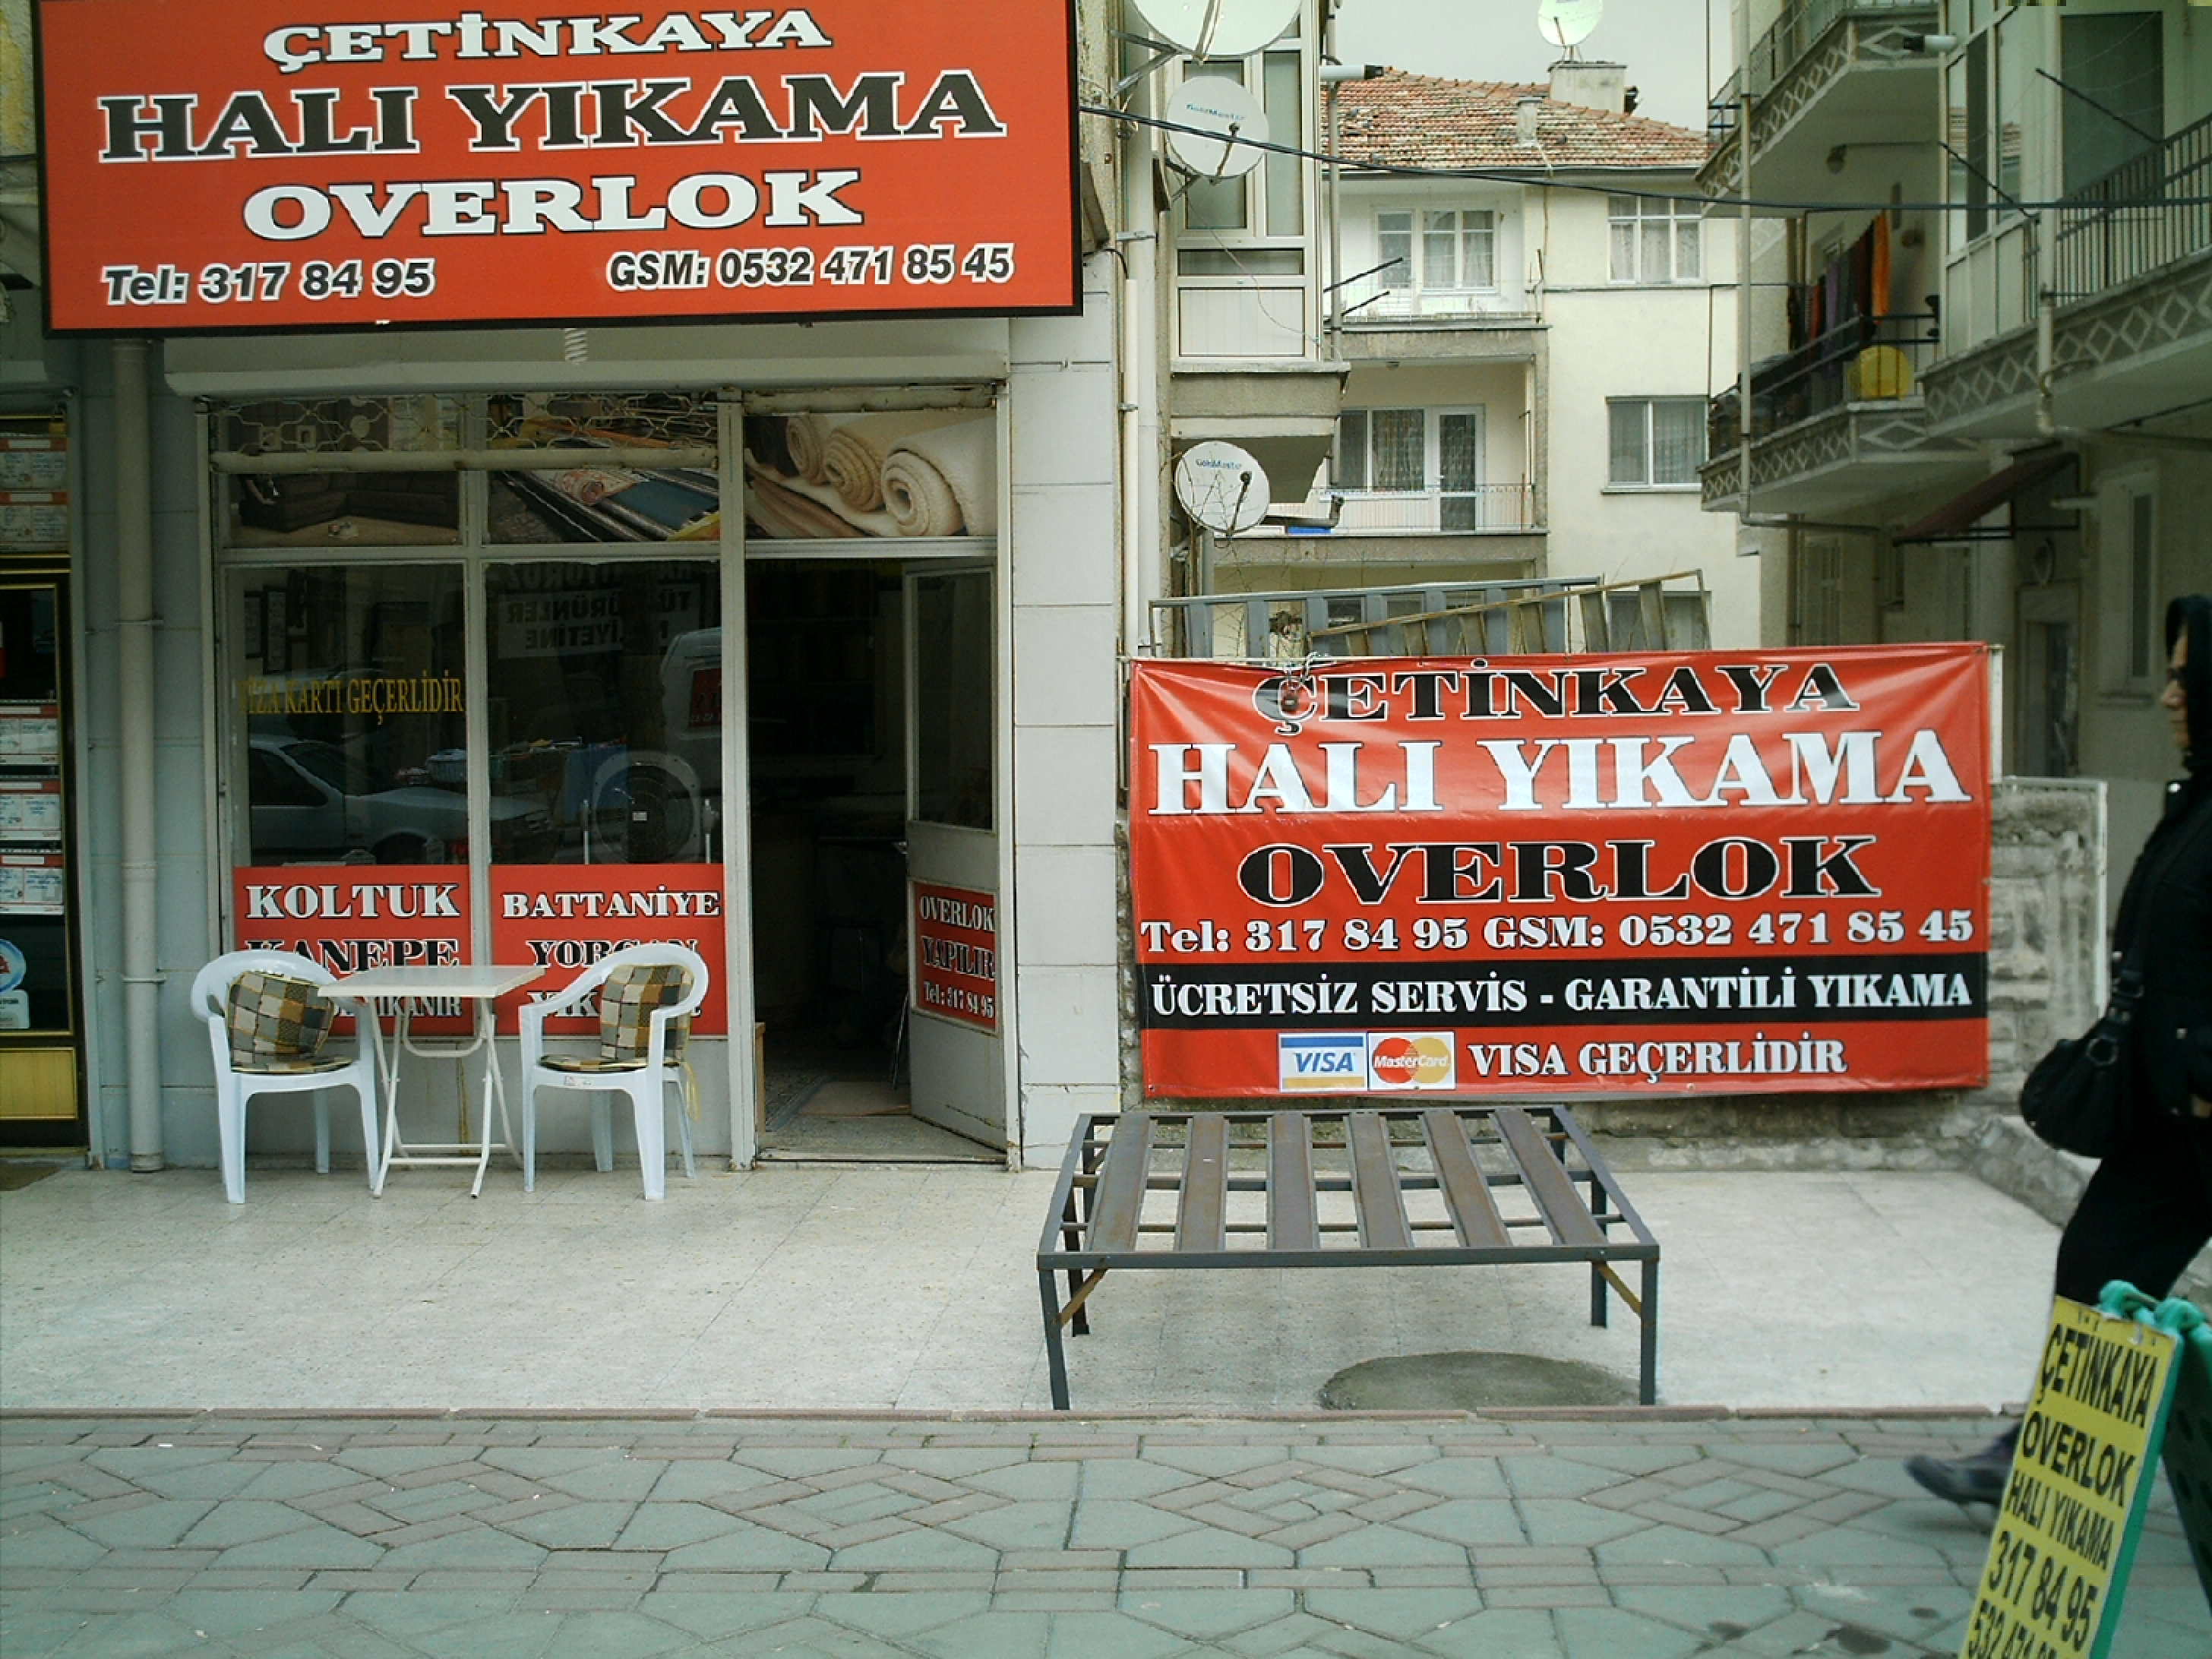 camlik_hali_yikama-1